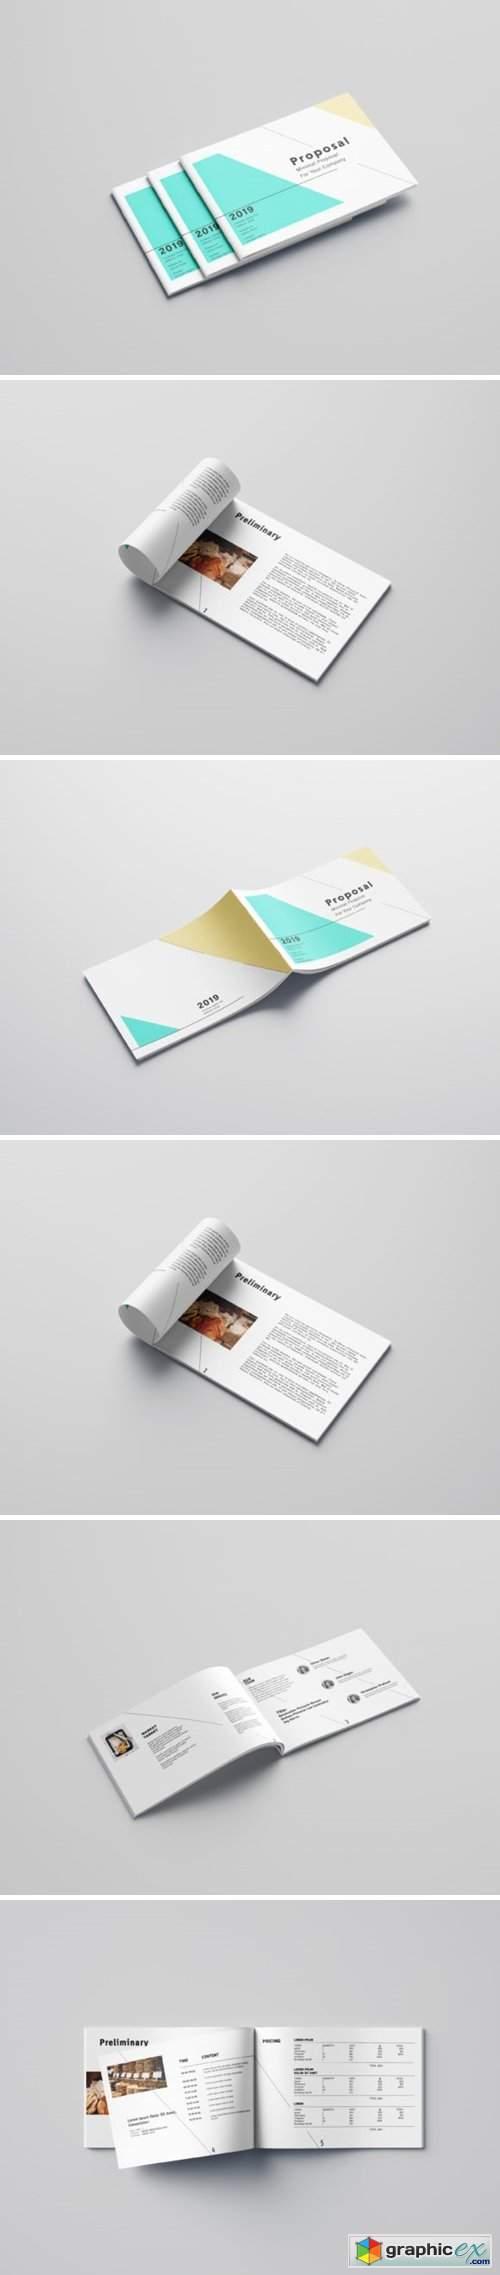 Minimalist Proposal Template Design